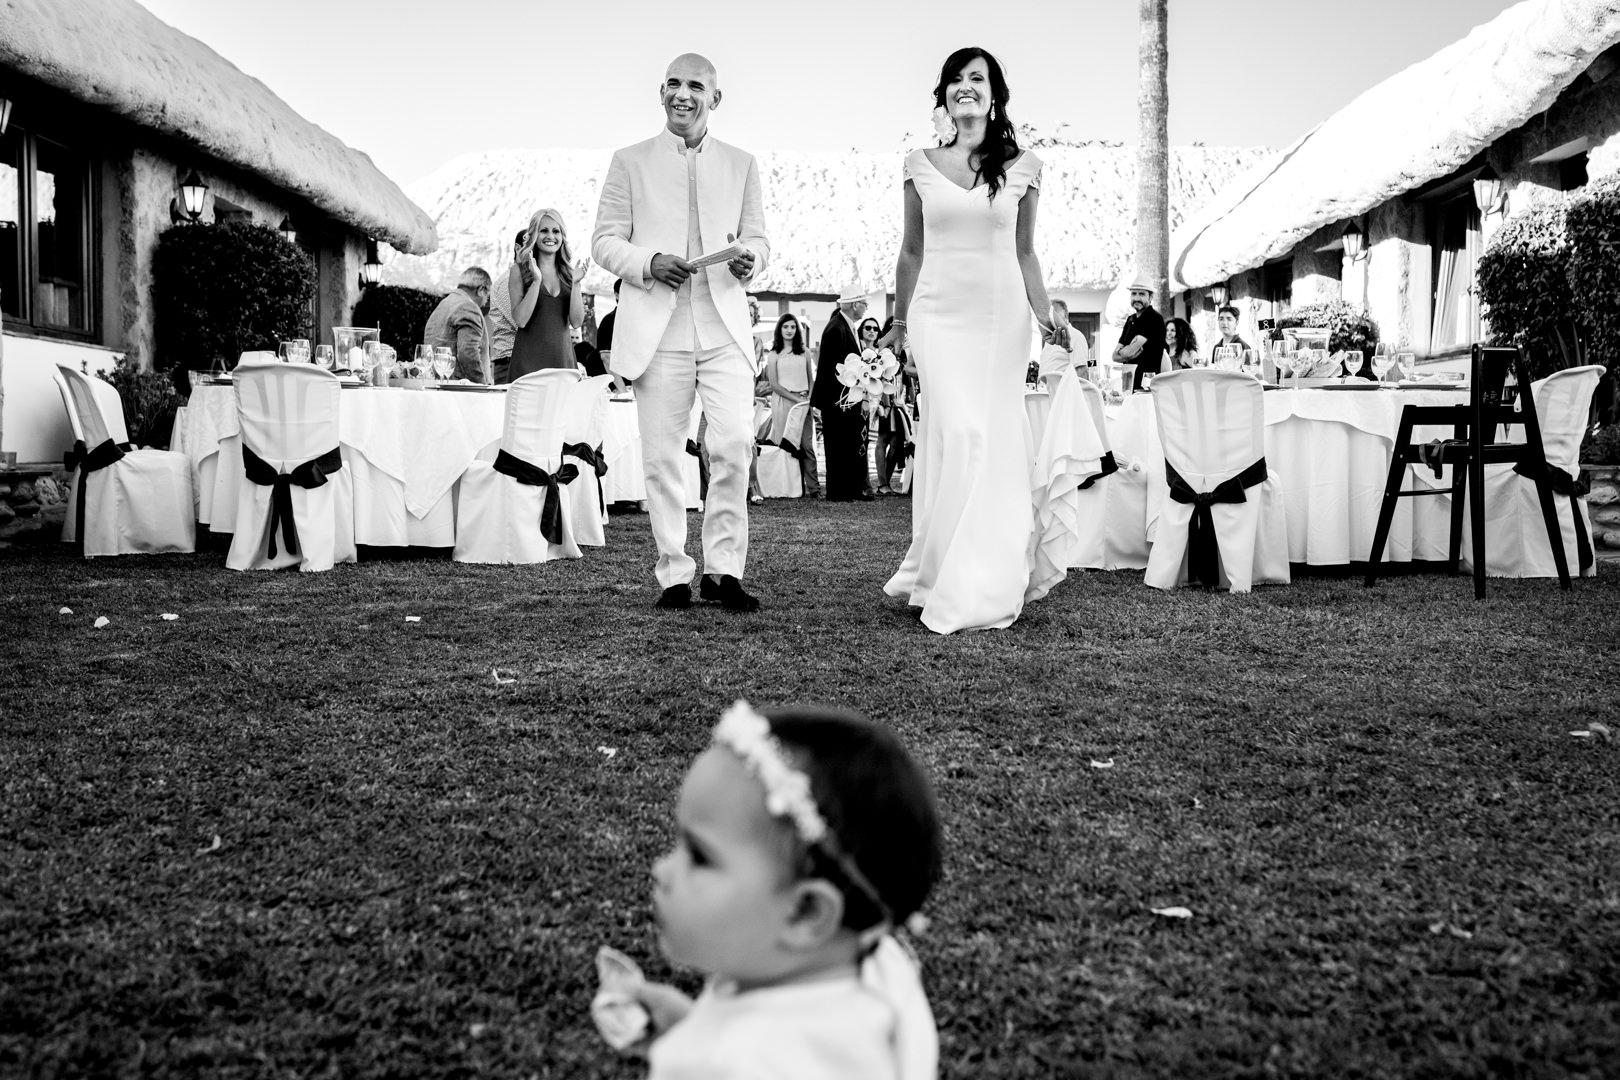 Boda-Sajorami-Beach-Cadiz-Zahora-Pedro-Gema-engagement-Rafael-Torres-fotografo-bodas-sevilla-madrid-barcelona-wedding-photographer--39.jpg